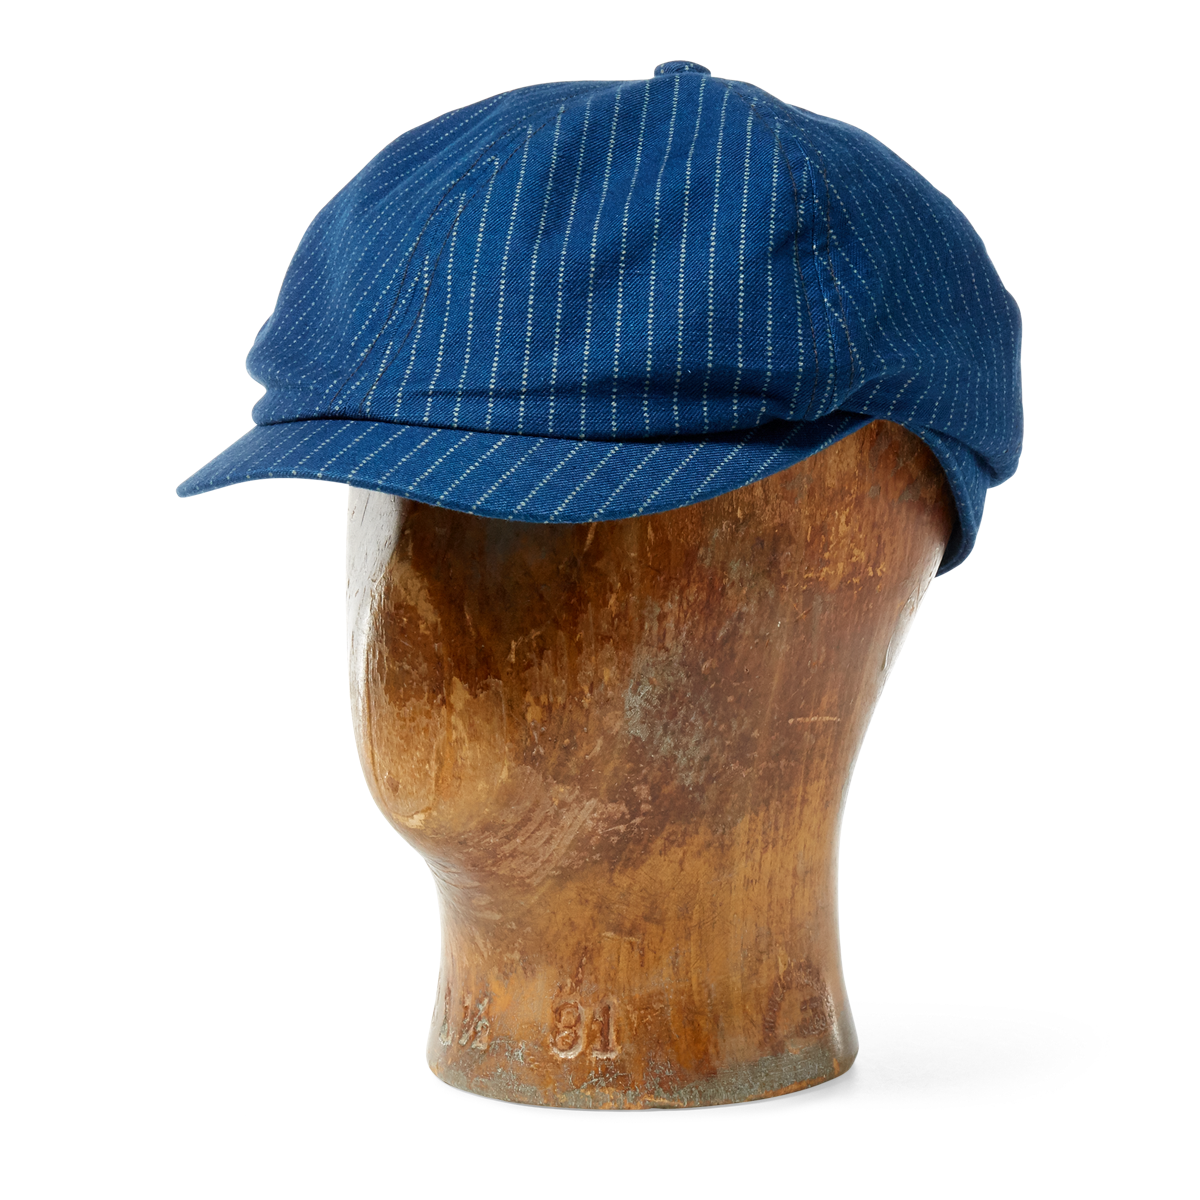 6881eec1 Cotton-Linen Newsboy Cap